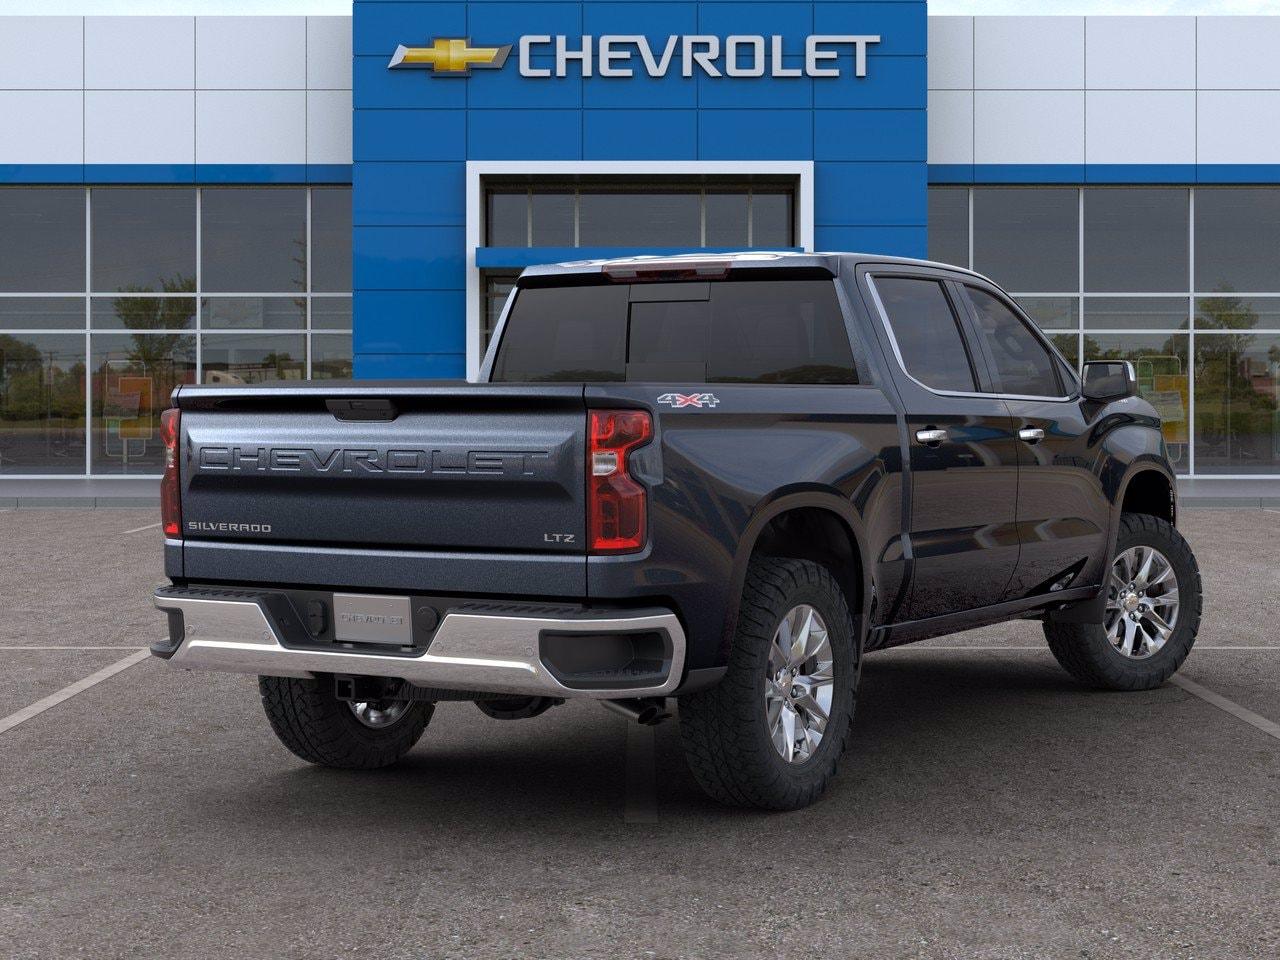 2020 Chevrolet Silverado 1500 Crew Cab 4x4, Pickup #C201431 - photo 2